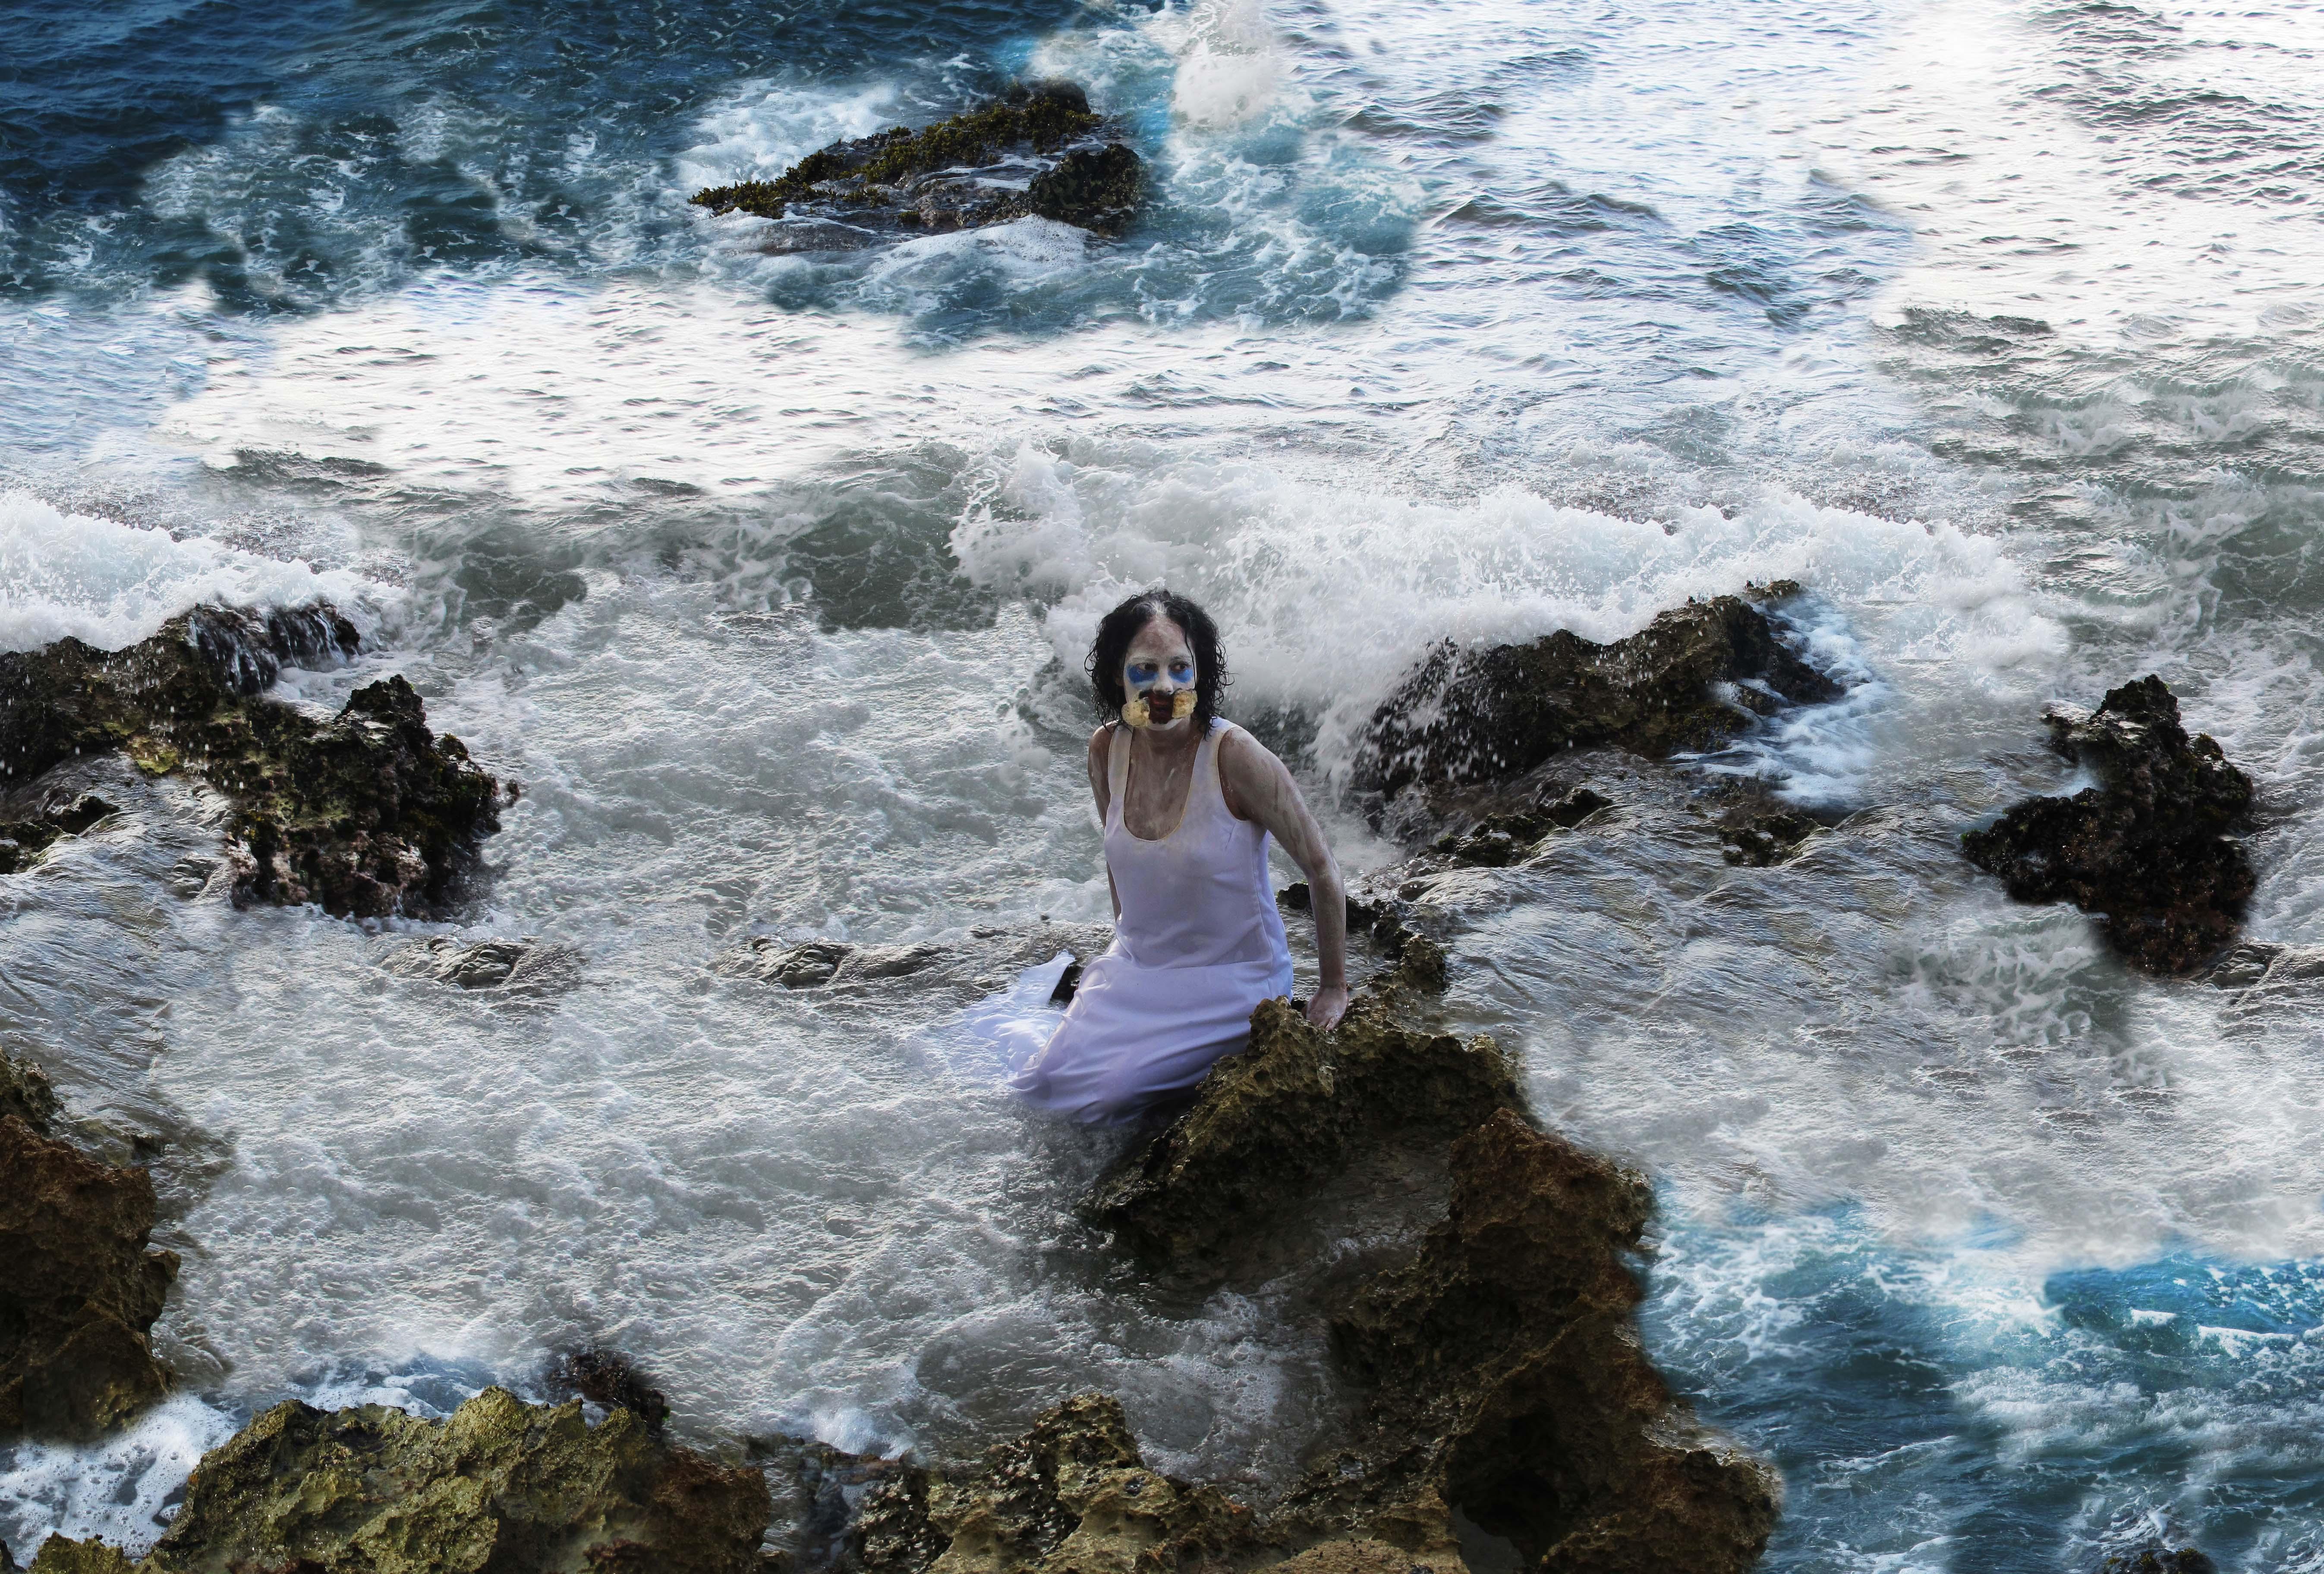 anglerfish entre pedras no mar revolto baixa (2)